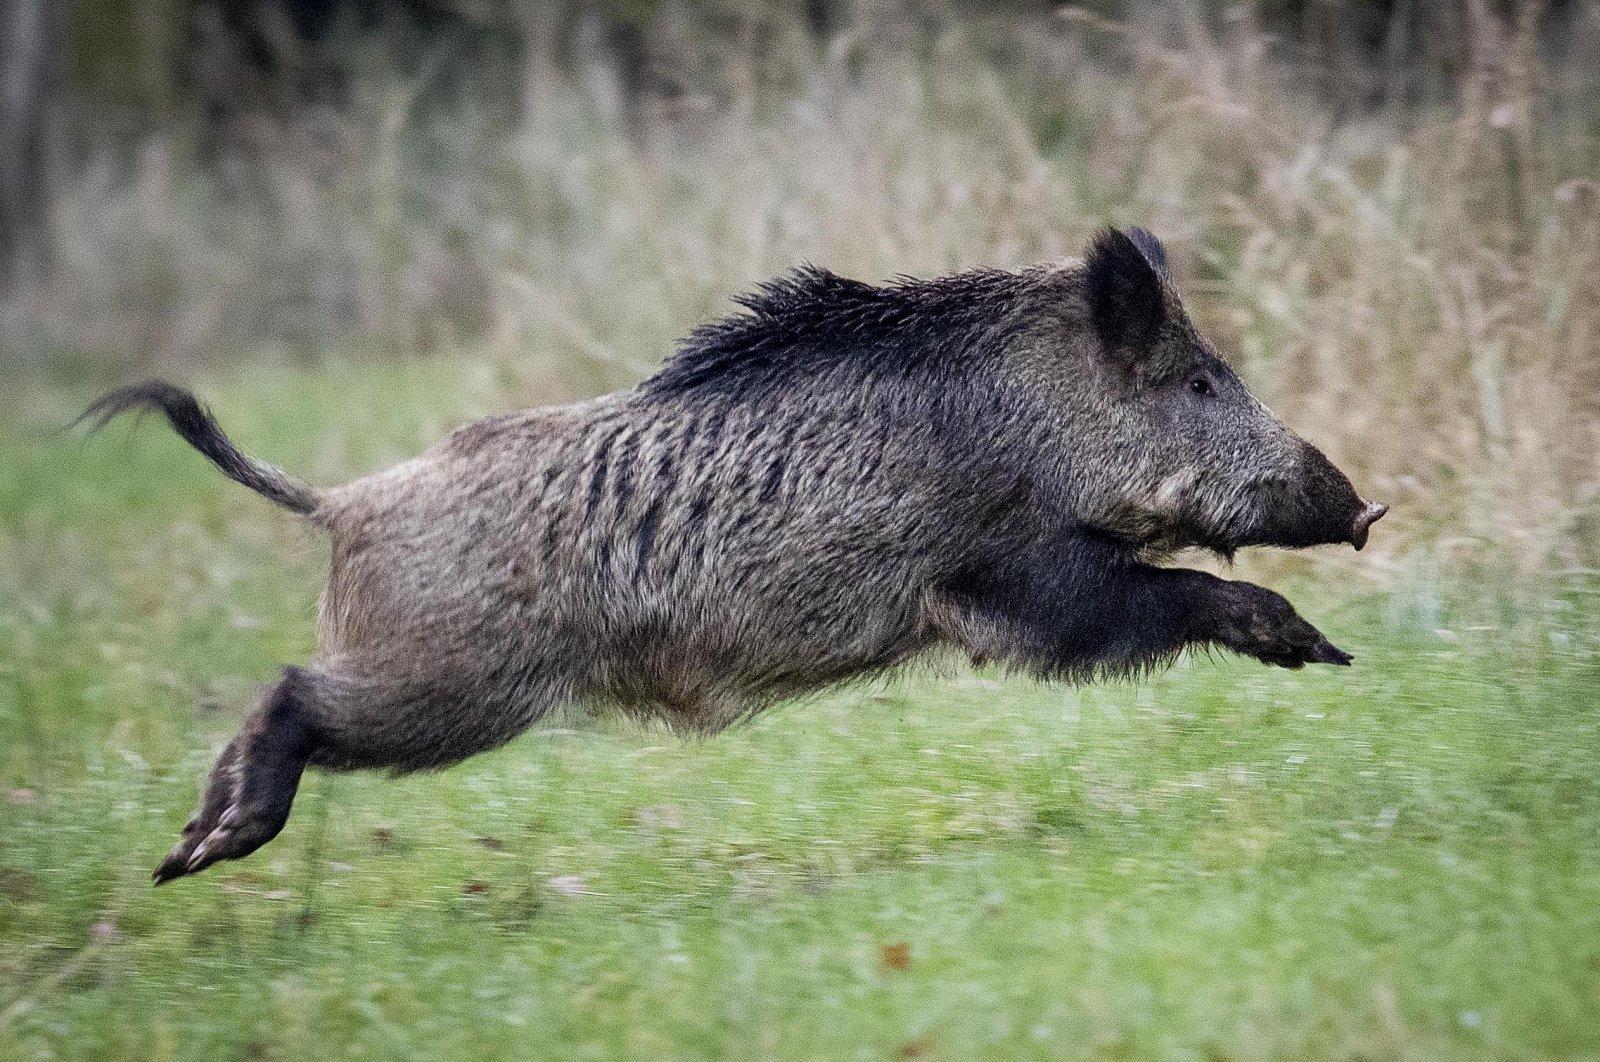 In this file photo, a wild boar jumps in the Taunus region near Frankfurt, Germany, Nov. 9, 2019. (AP Photo)